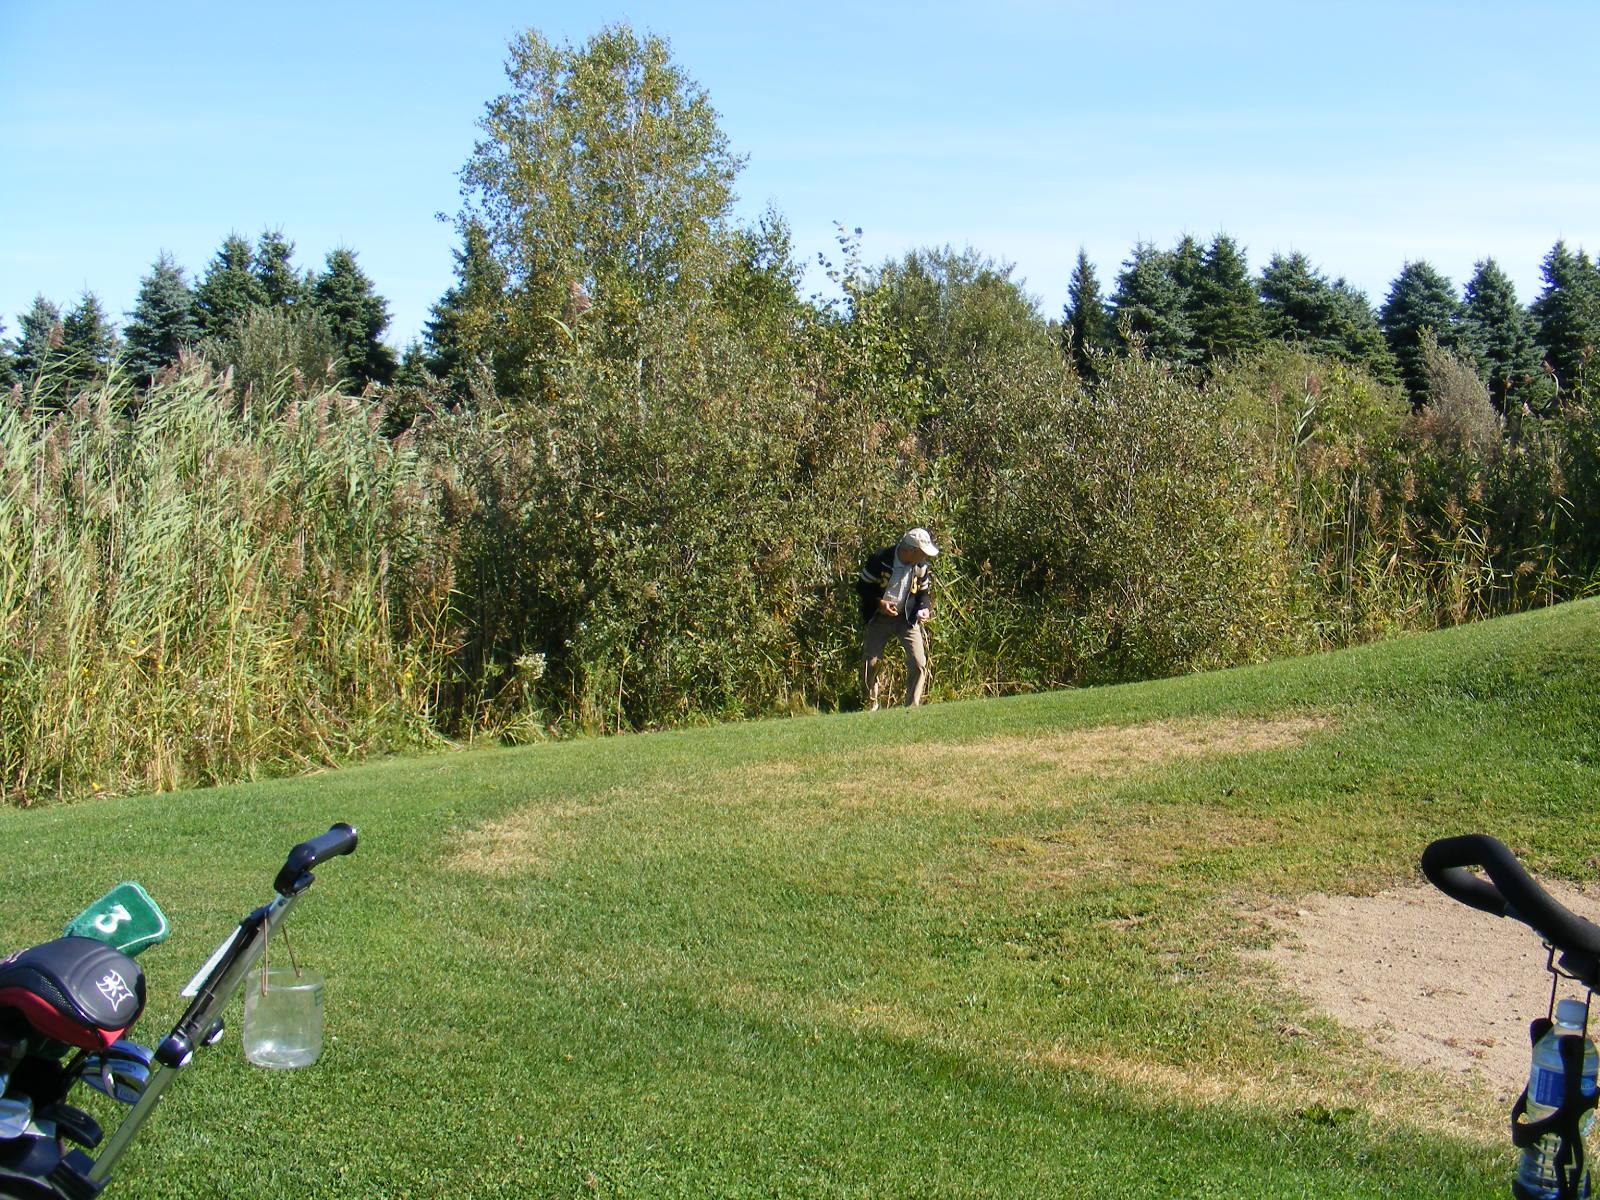 Psychologie du golf ou l'art de scrapper une ronde de golf